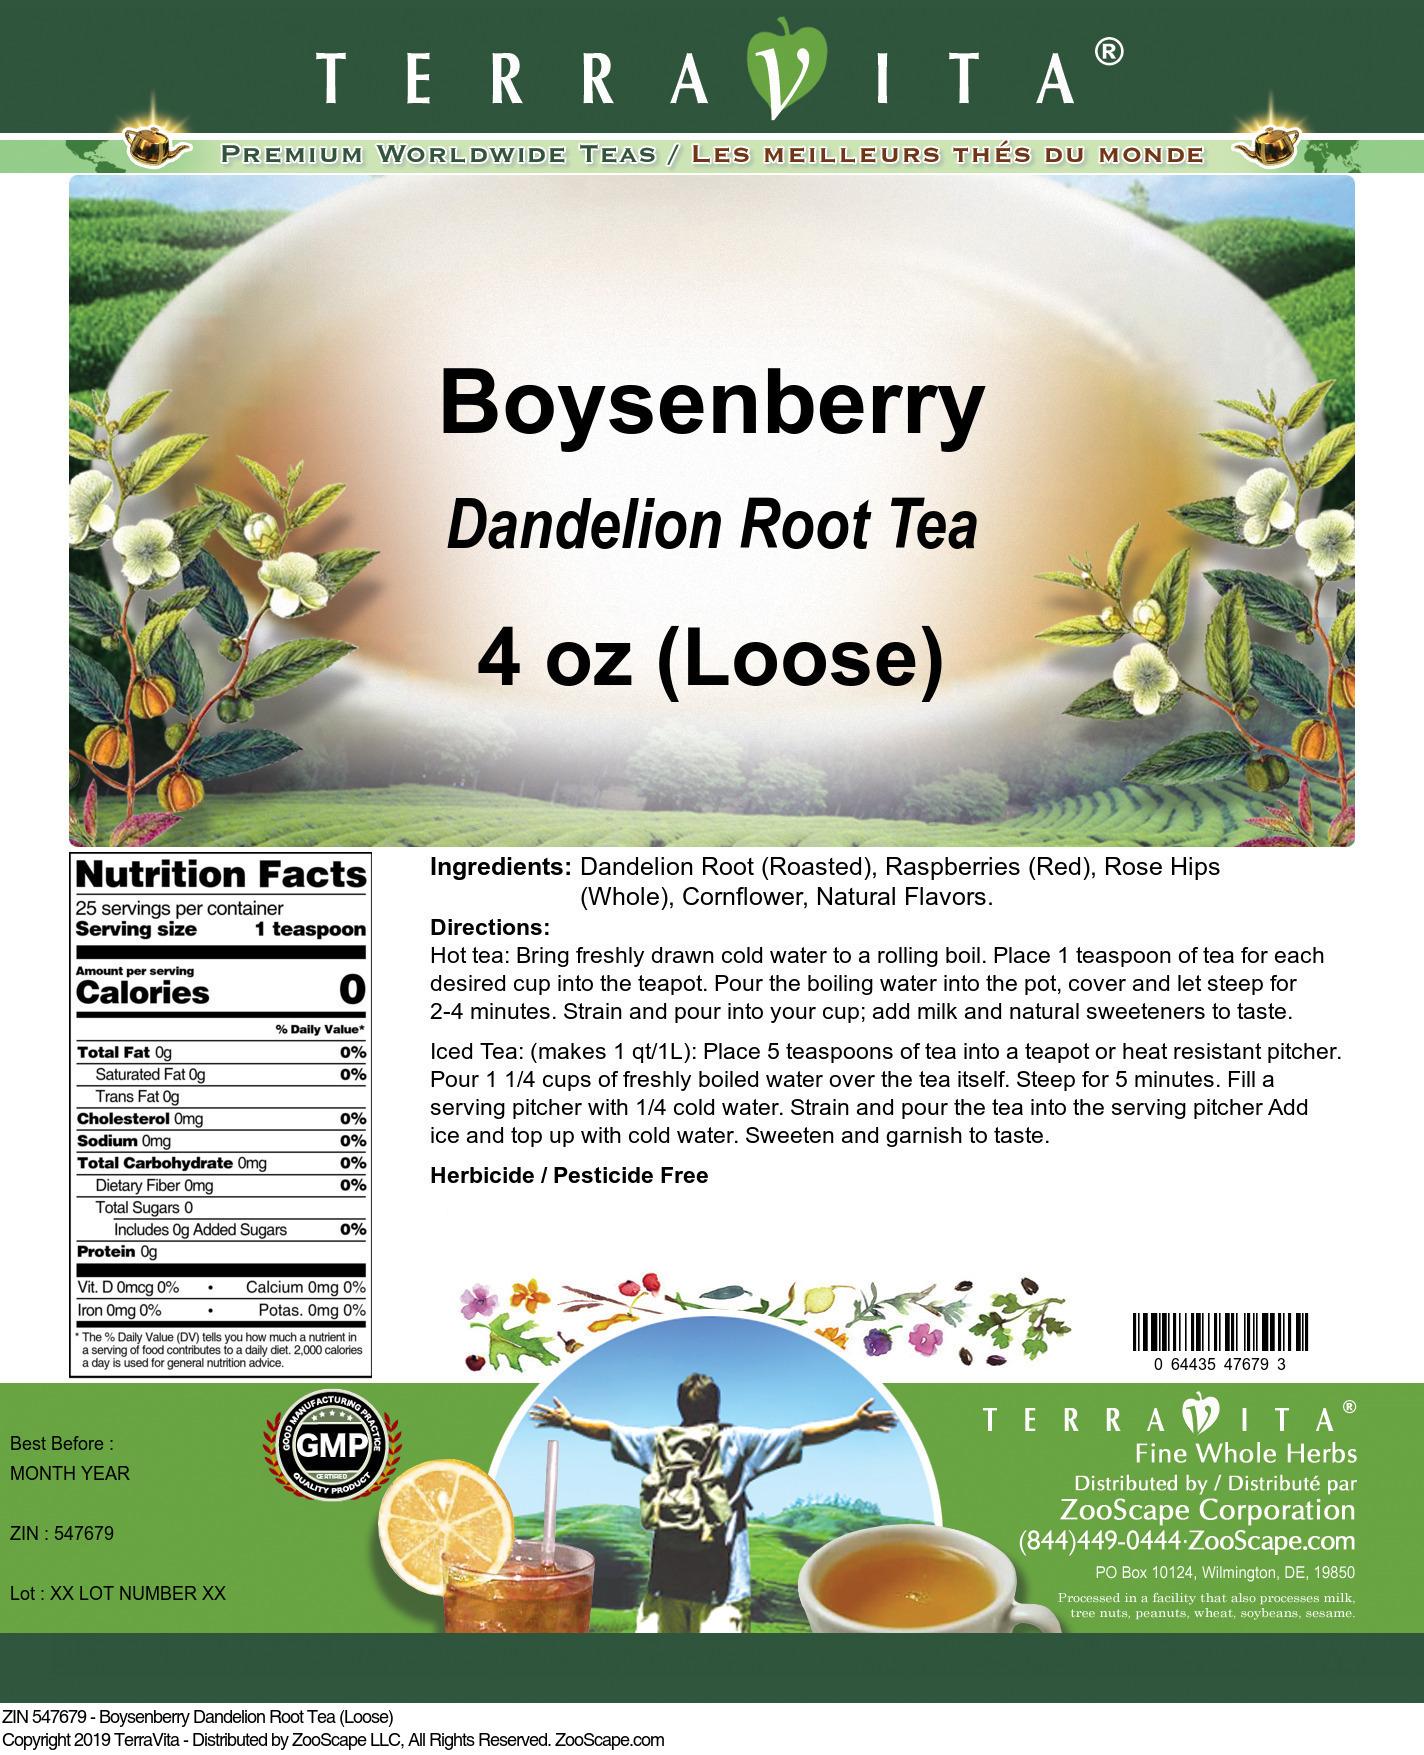 Boysenberry Dandelion Root